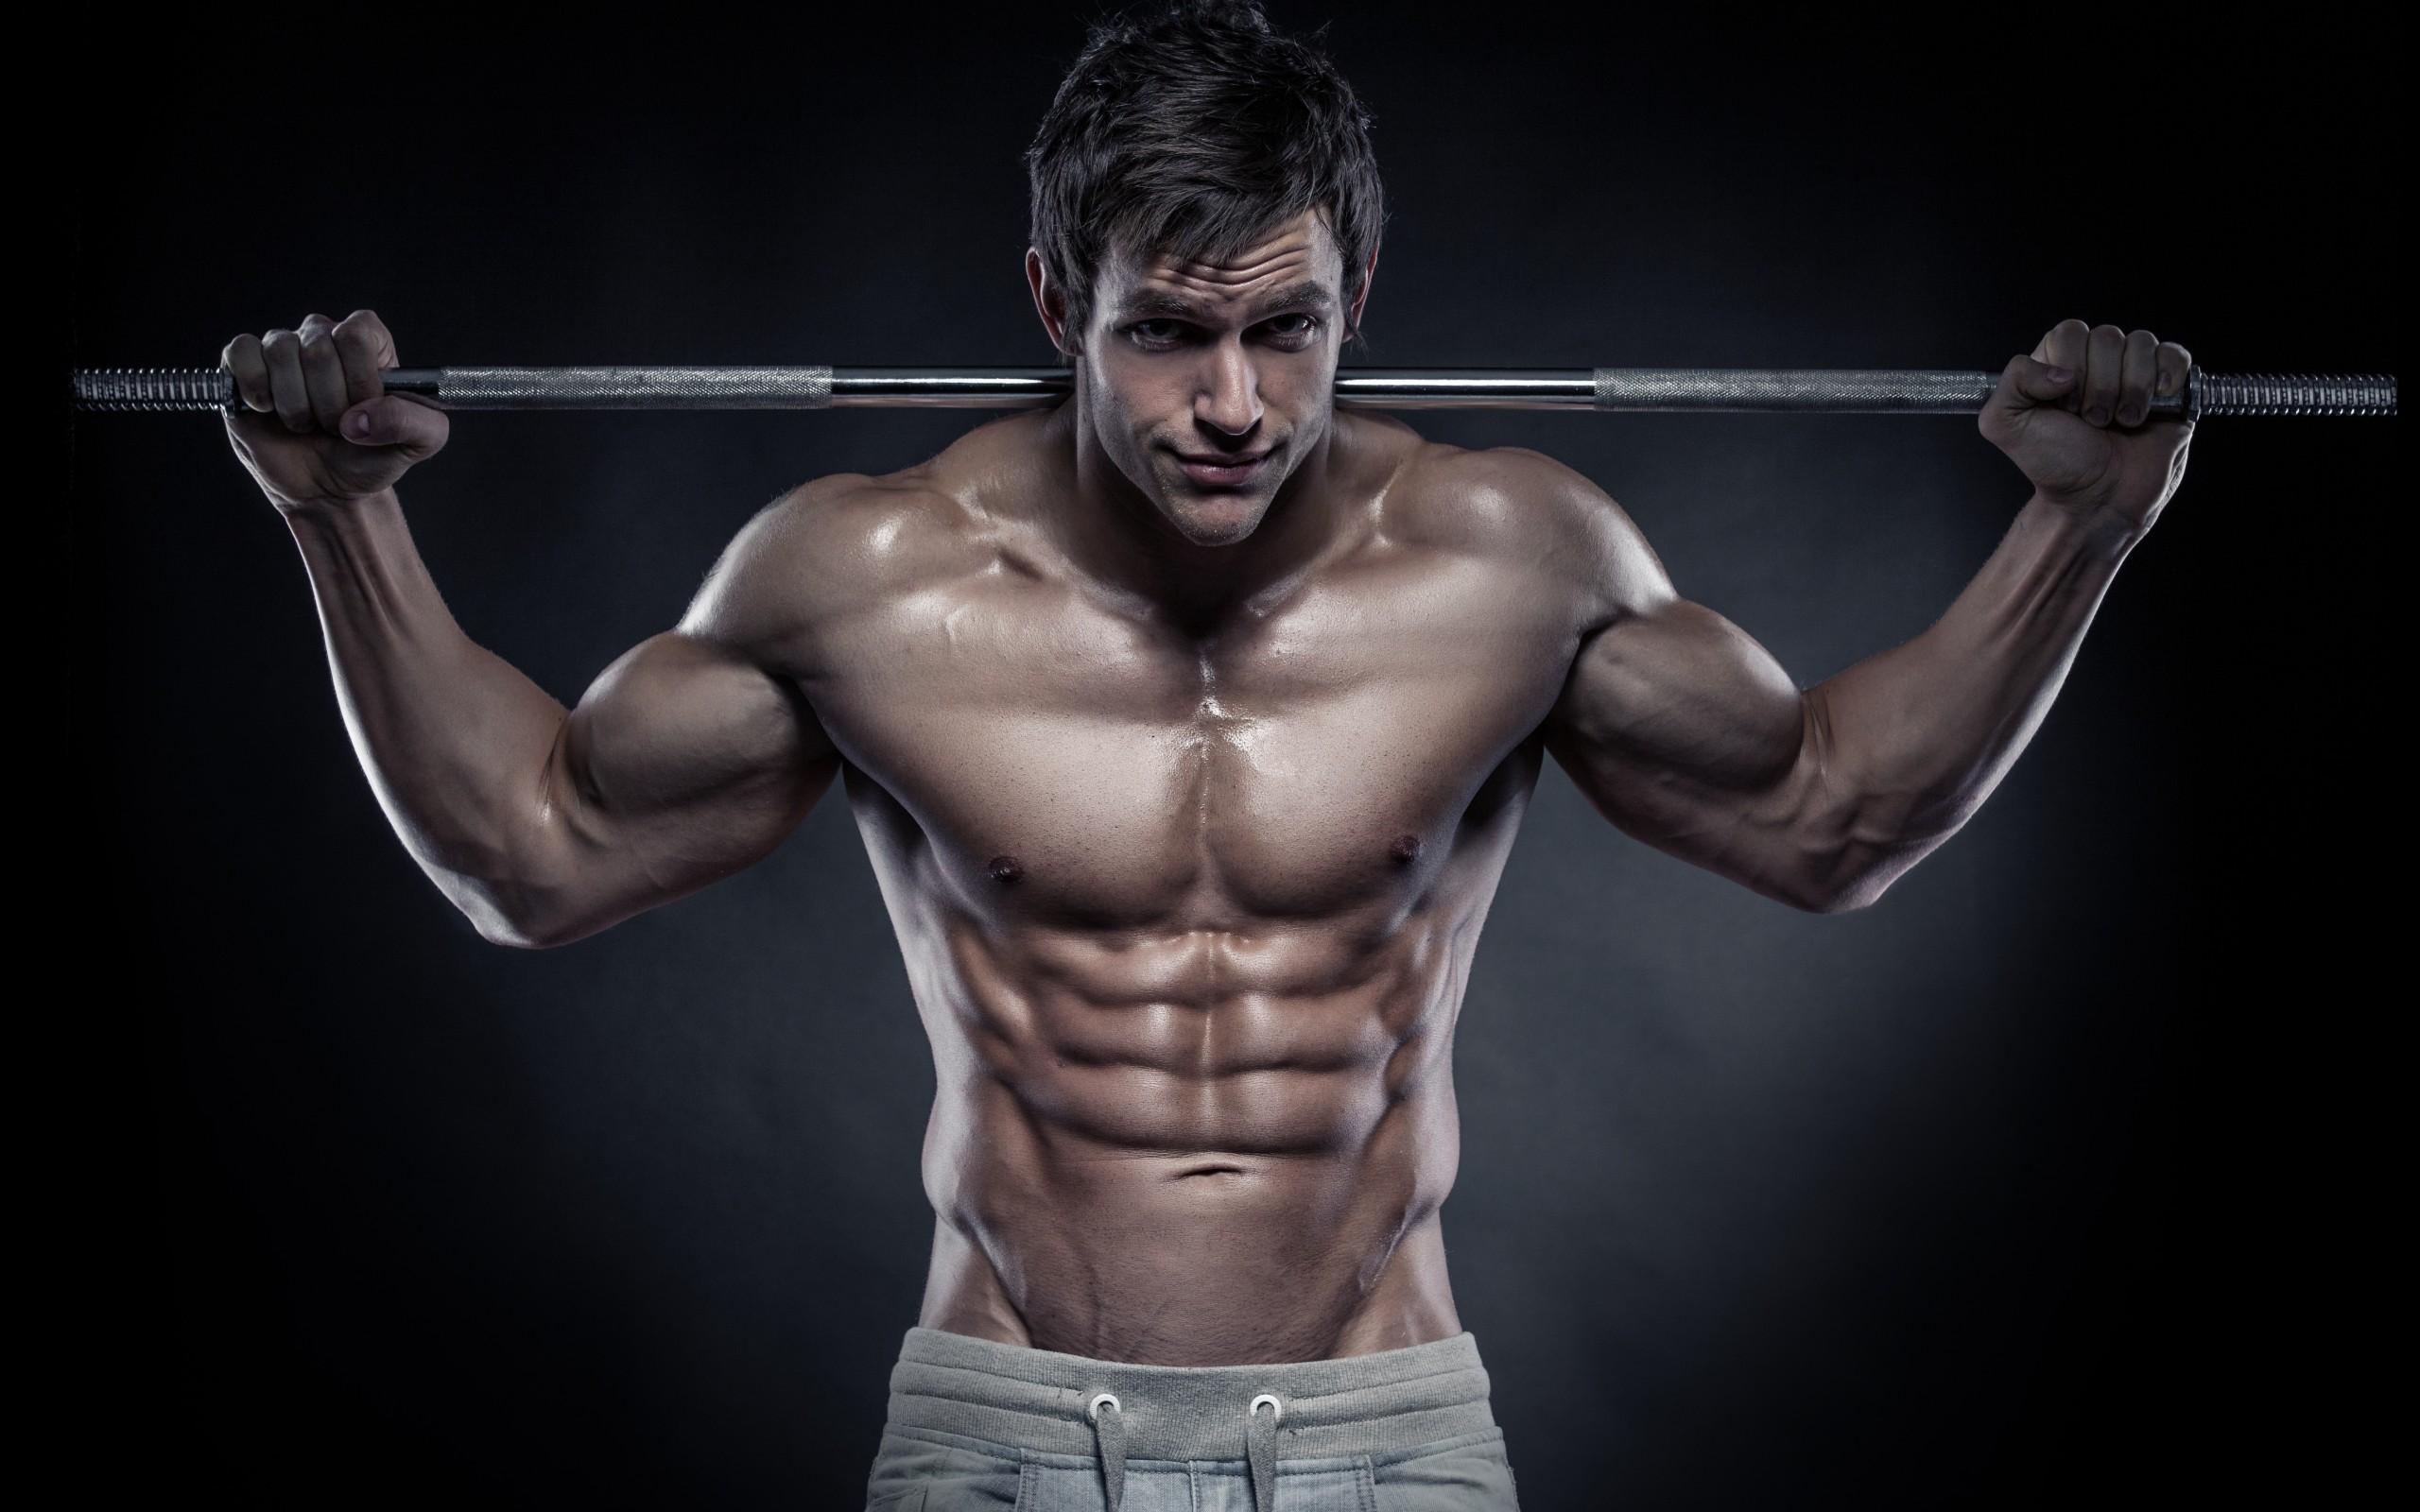 Træningsprogram muskelvækst